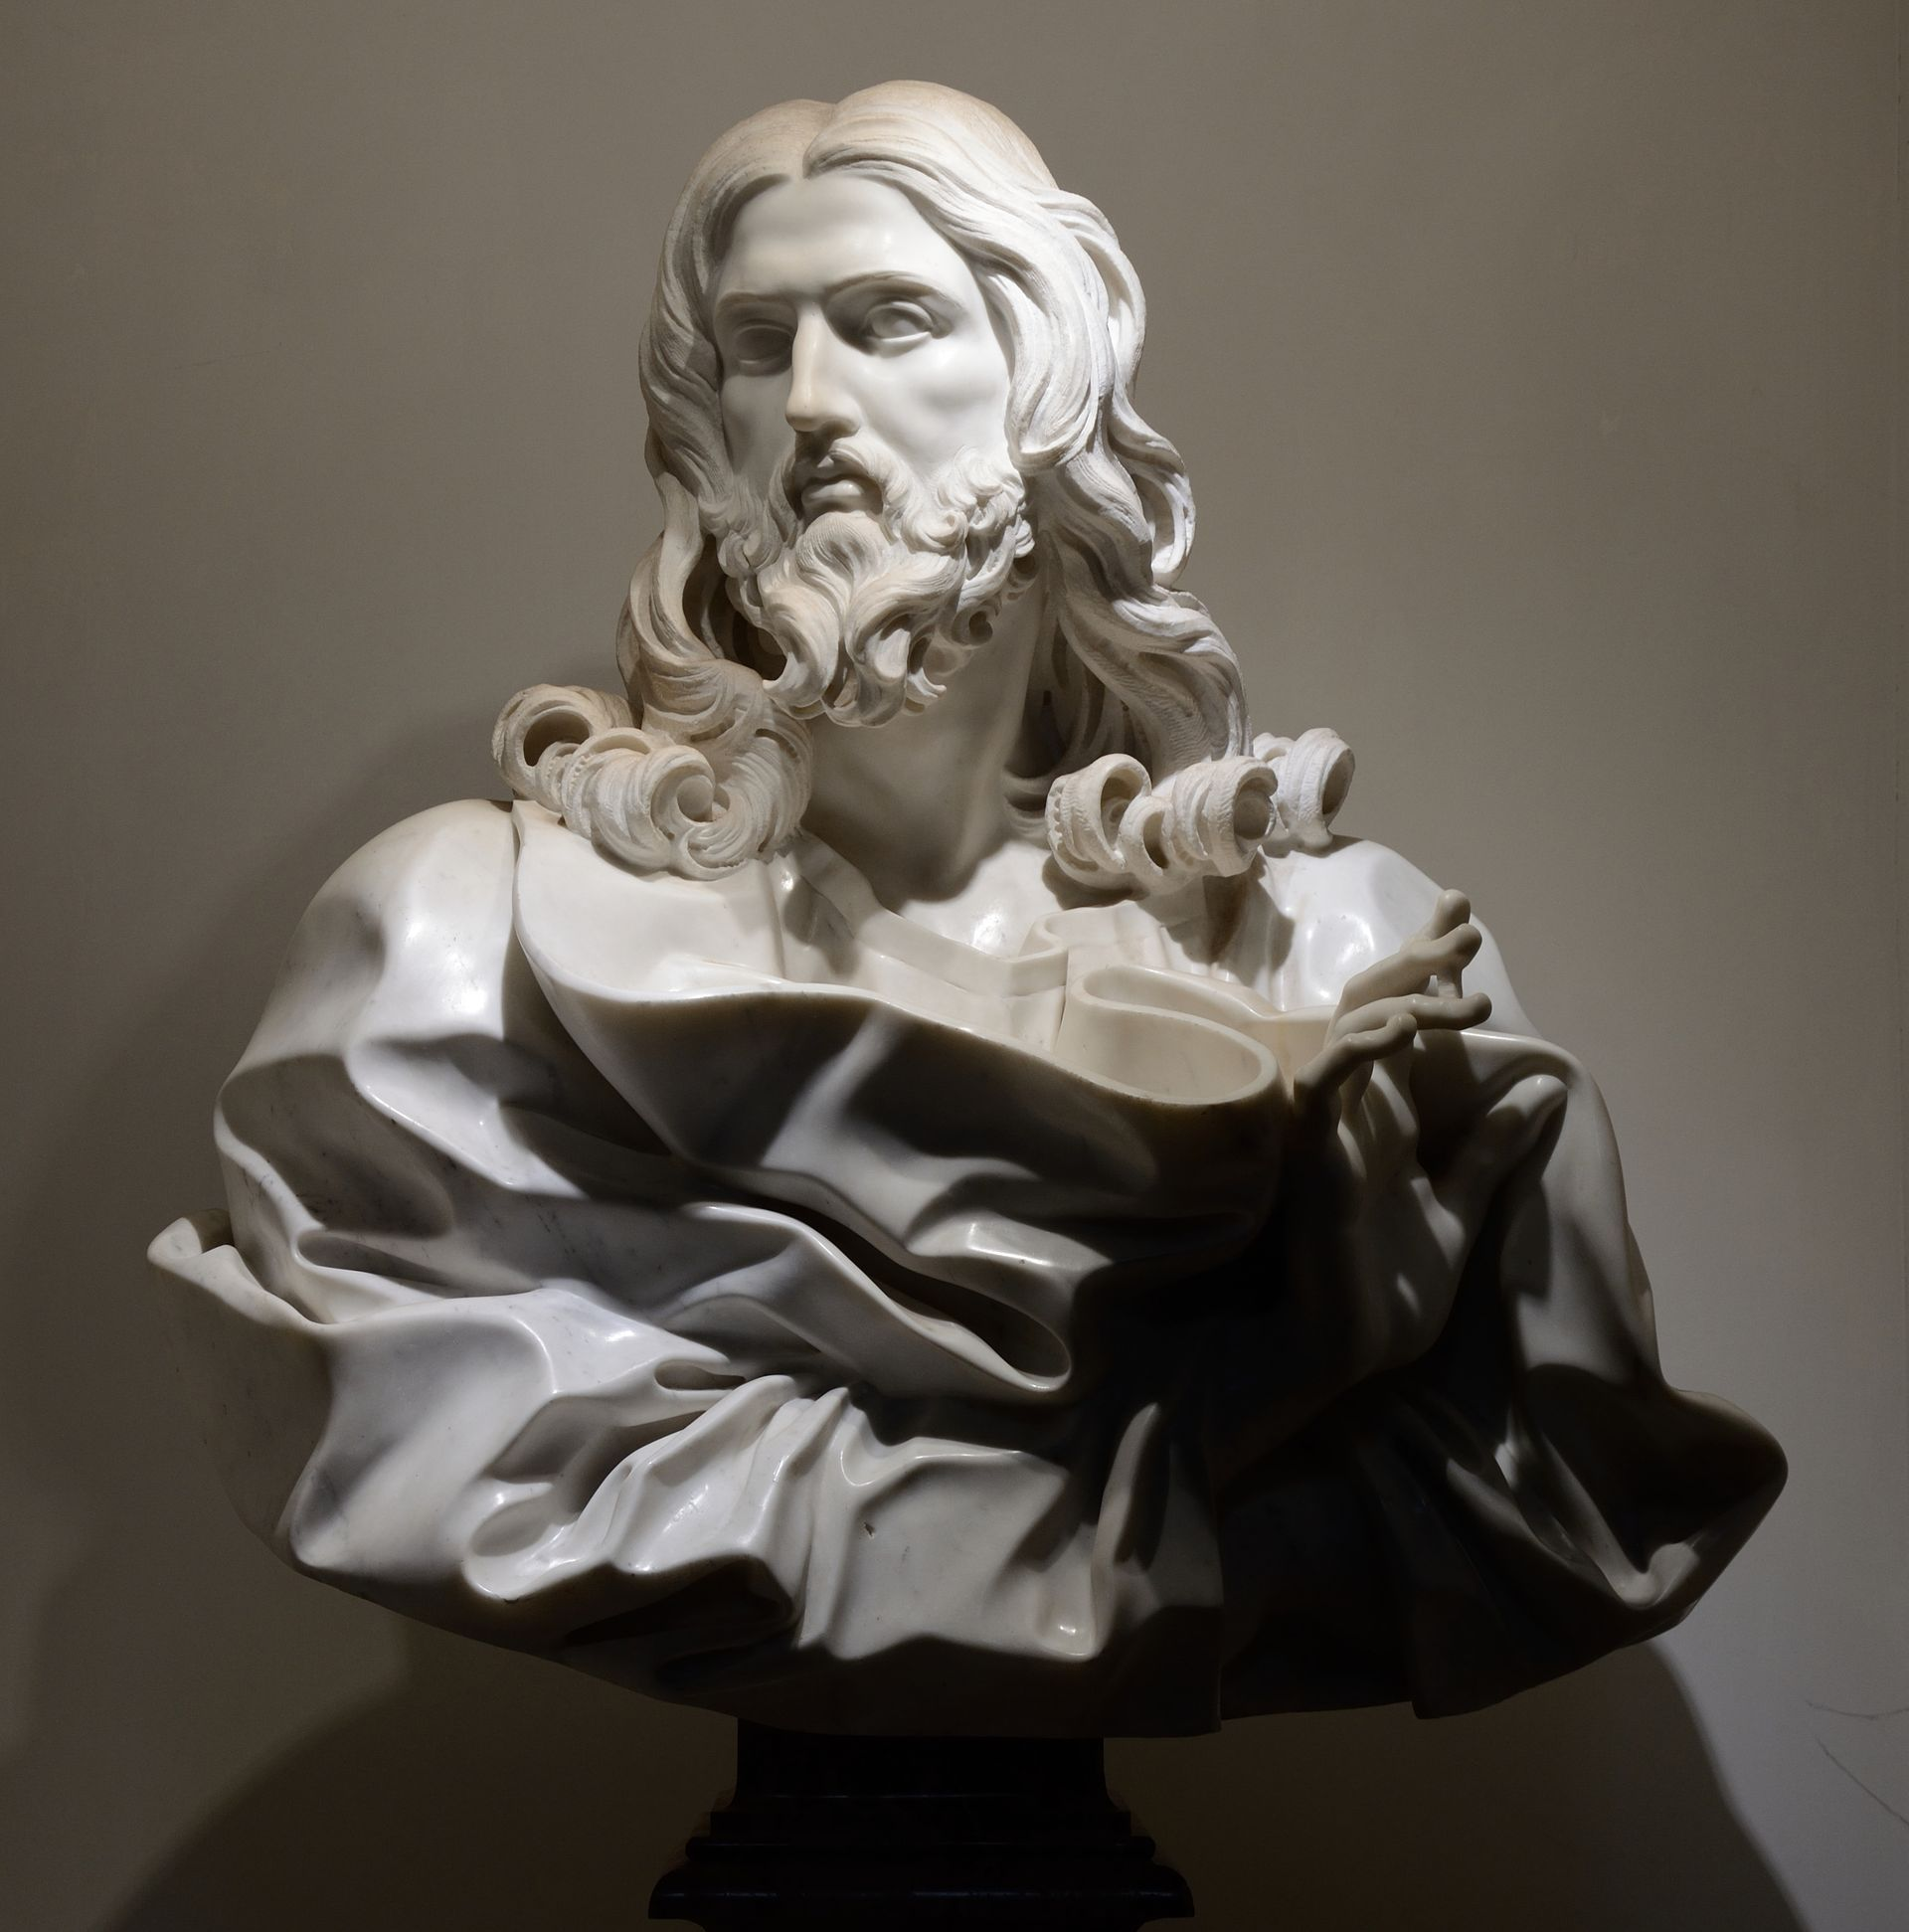 Bust of Jesus Christ by Gianlorenzo Bernini - List of works by Gian ...